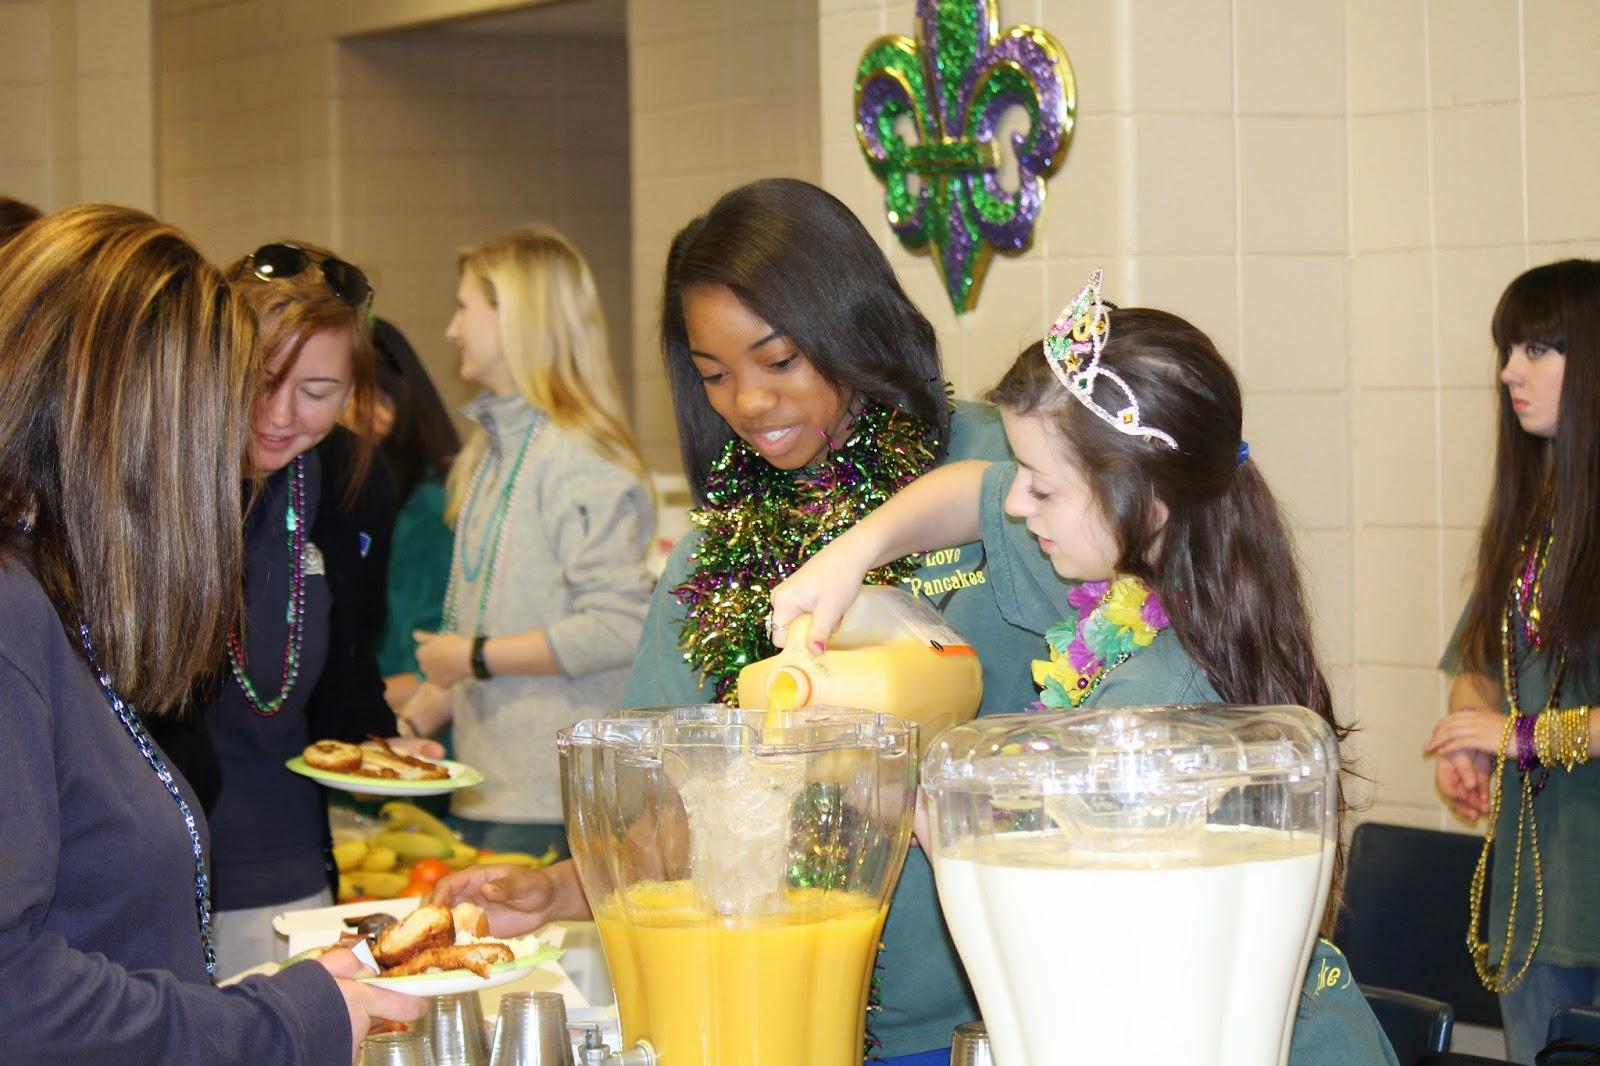 Montgomery Catholic Preparatory News 15th Annual Mardi Gras Prayer Breakfast Hosted By